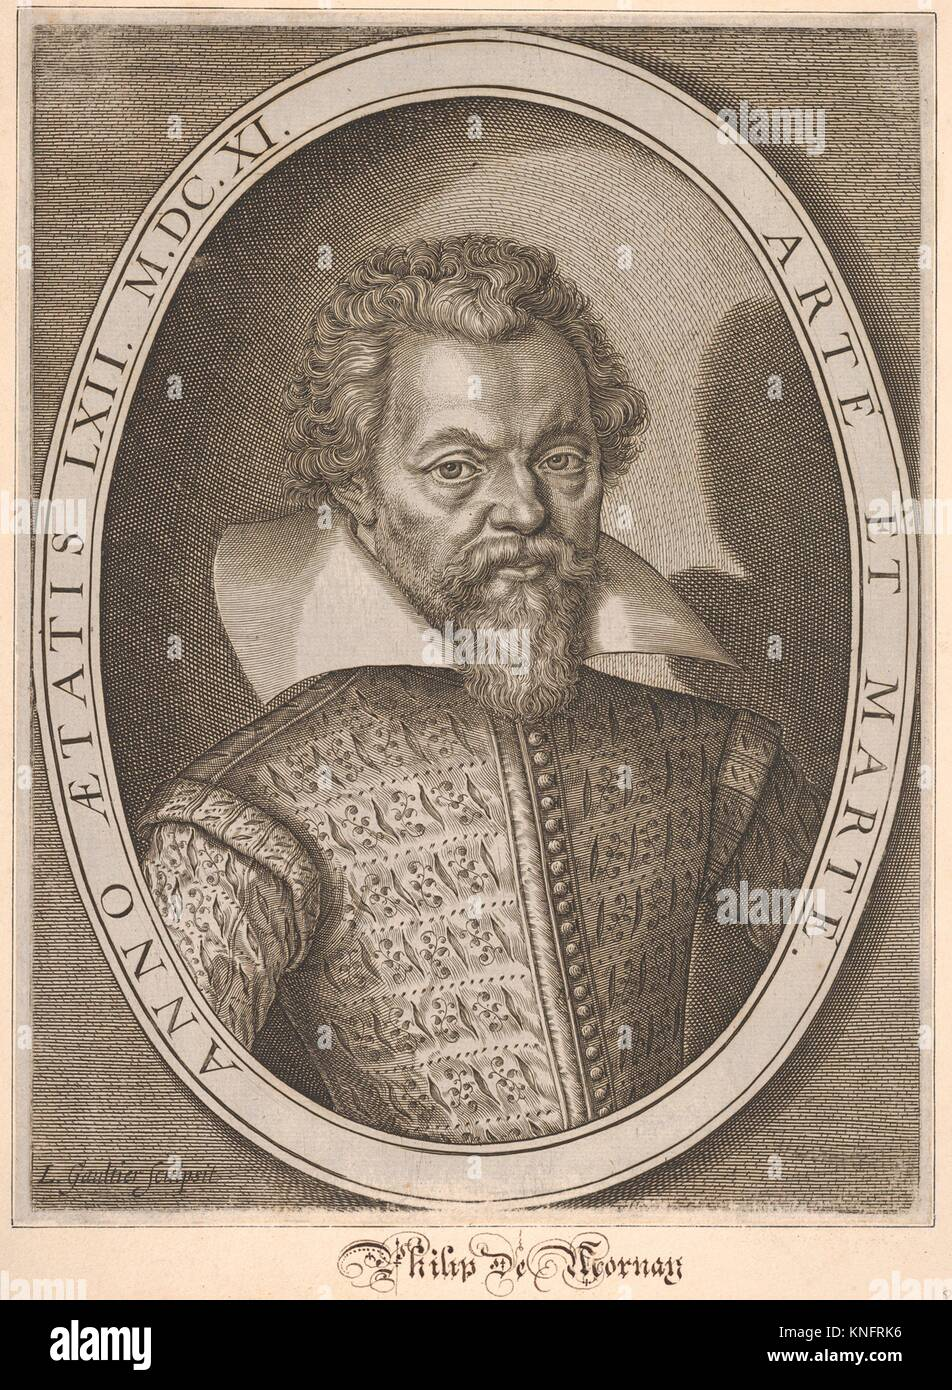 Philip de Mornay. Artist: Léonard Gaultier (French, Mayence 1561-1641 Paris); Date: 17th century; Medium: Engraving; Stock Photo